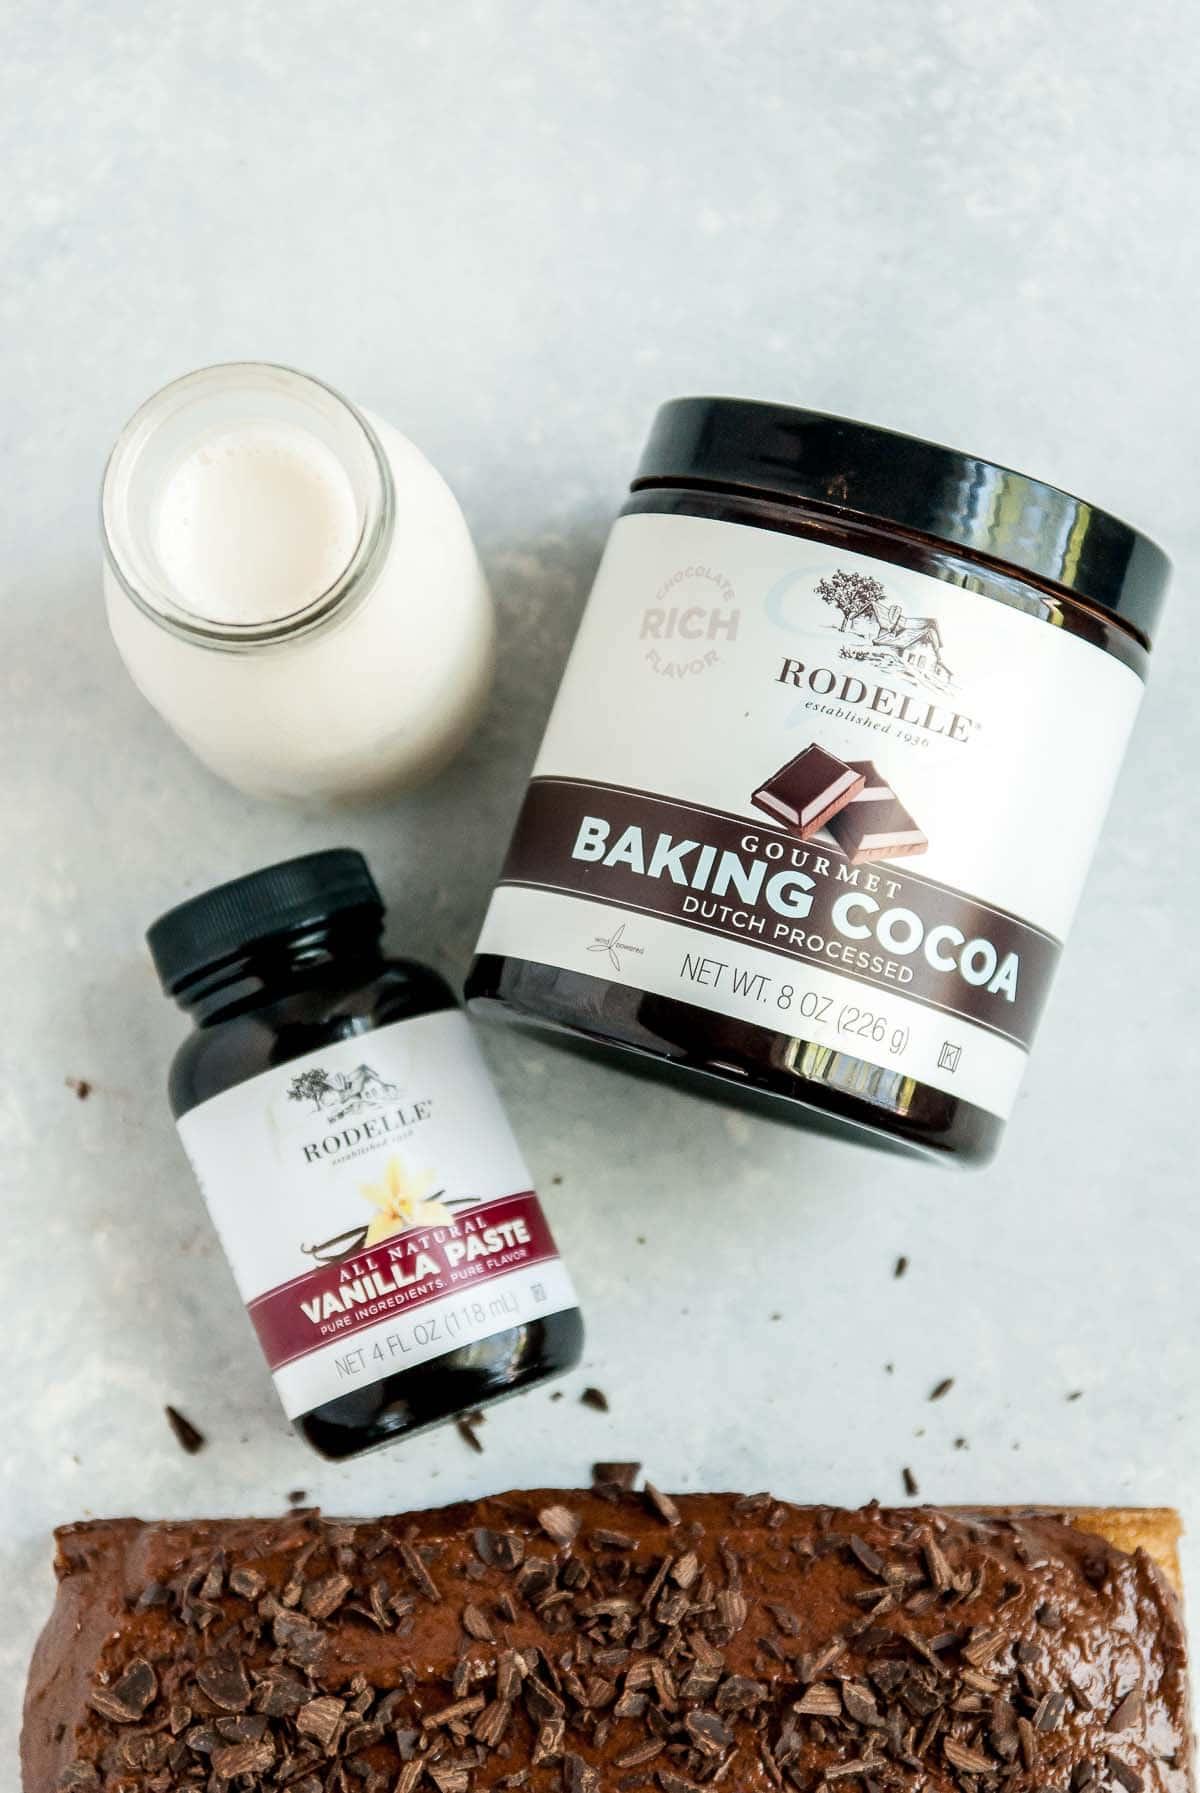 vanilla extract and cocoa powder with cake